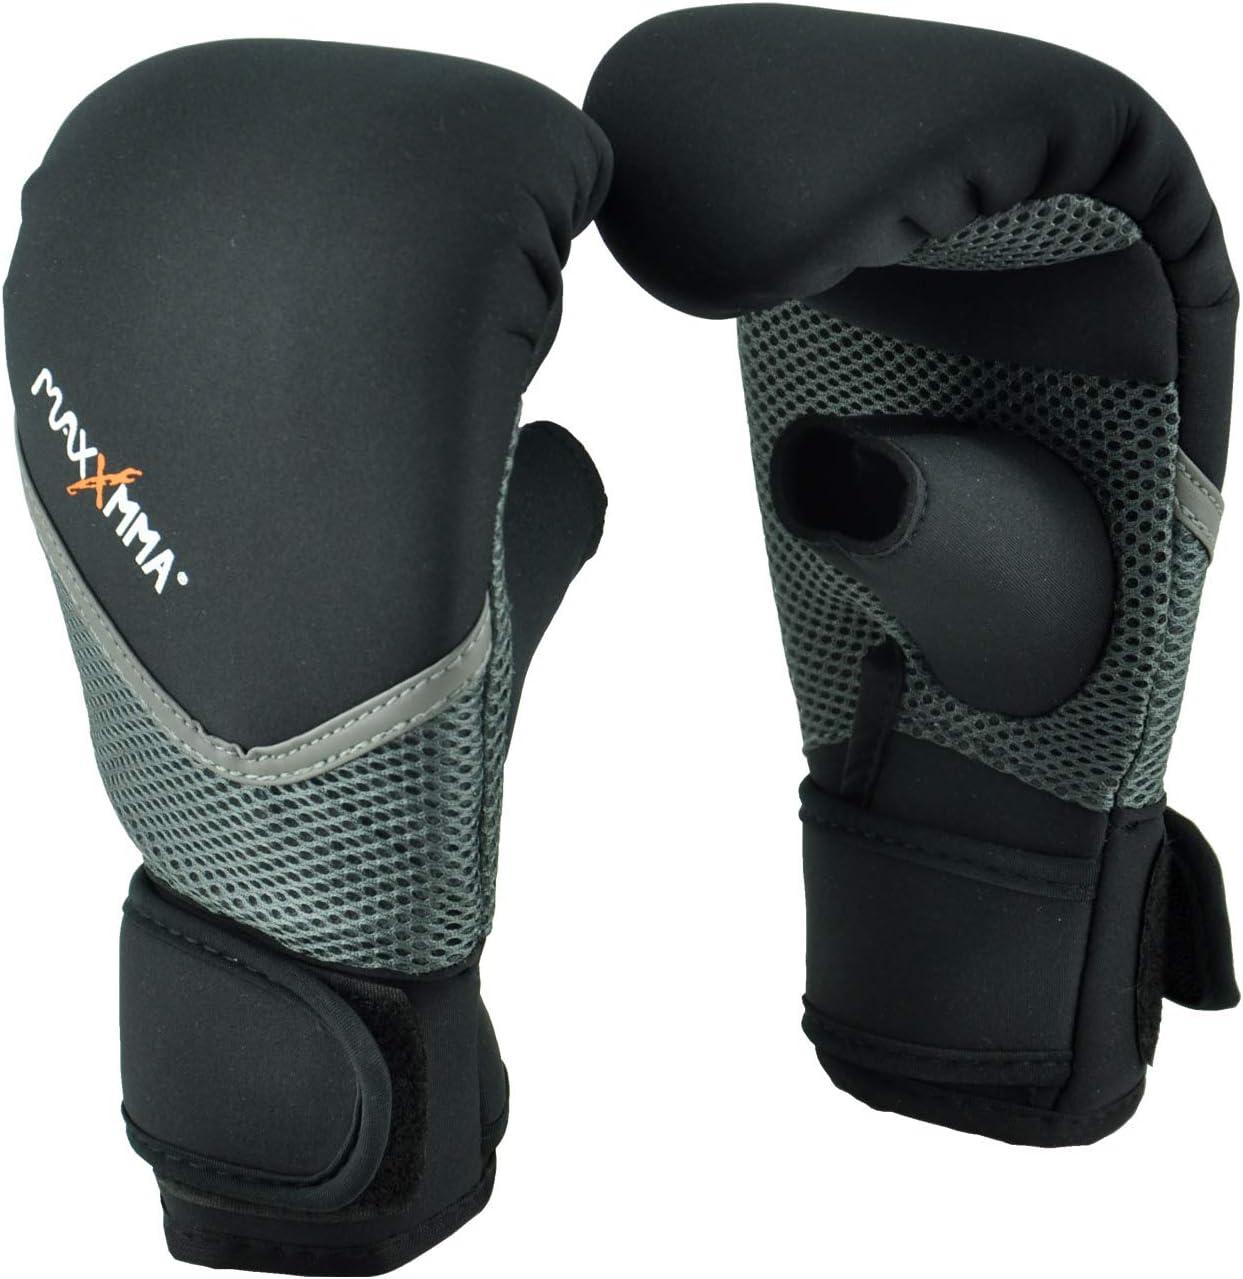 MaxxMMA Neoprene Washable Heavy Bag Gloves - Boxing Punching Tra